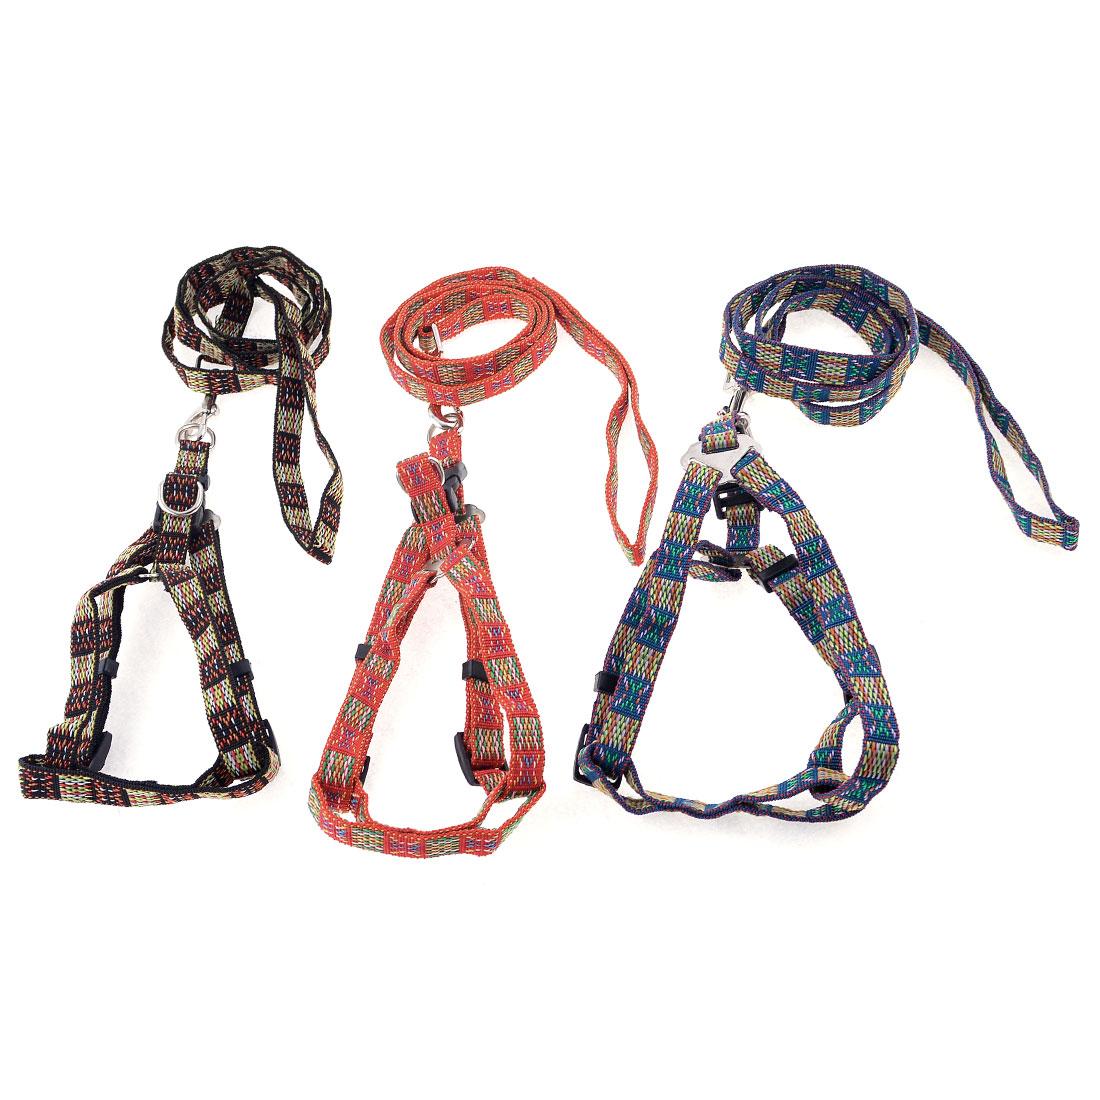 "Adjustable 0.6"" Width Strap Multicolored Dog Puppy Collar Halter Leash Lead 3PCS"